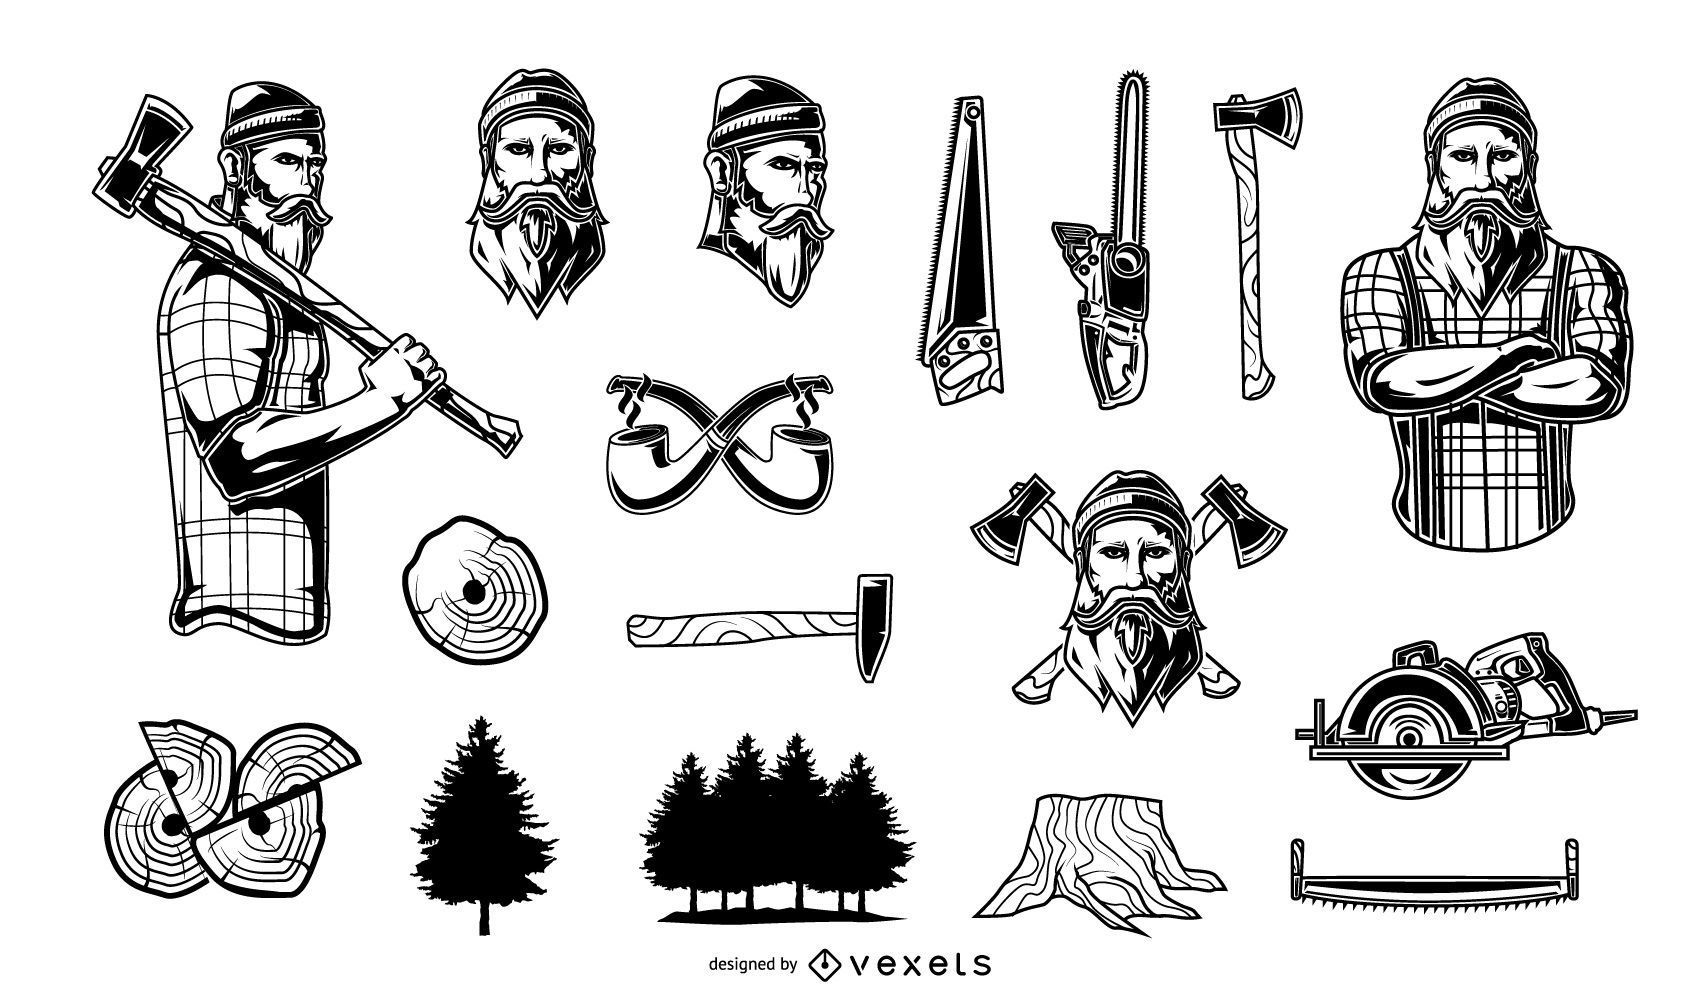 Lumberjack Vintage Monocolor Elements Collection